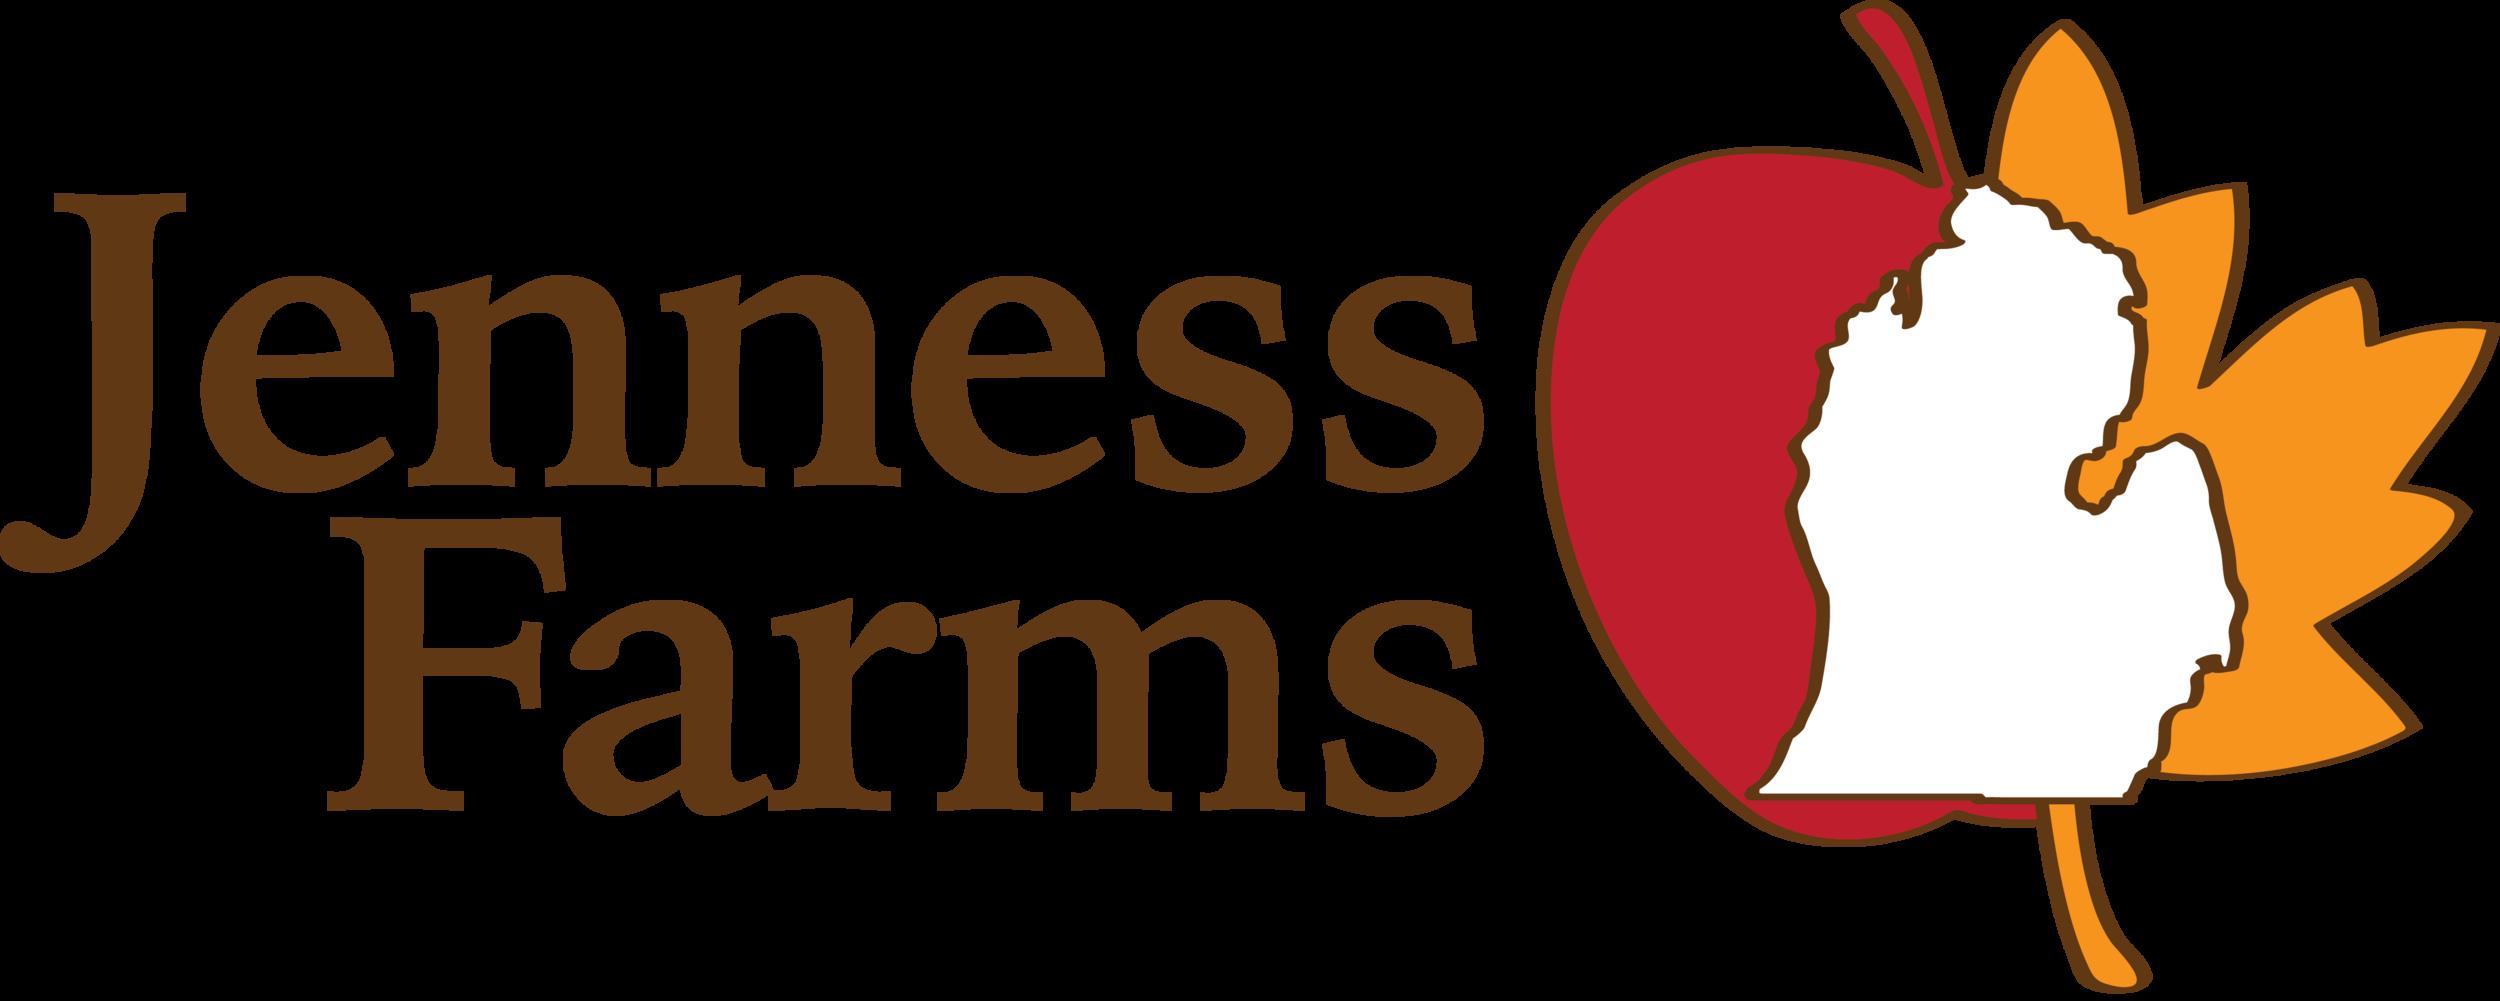 Jennes Farms Logo